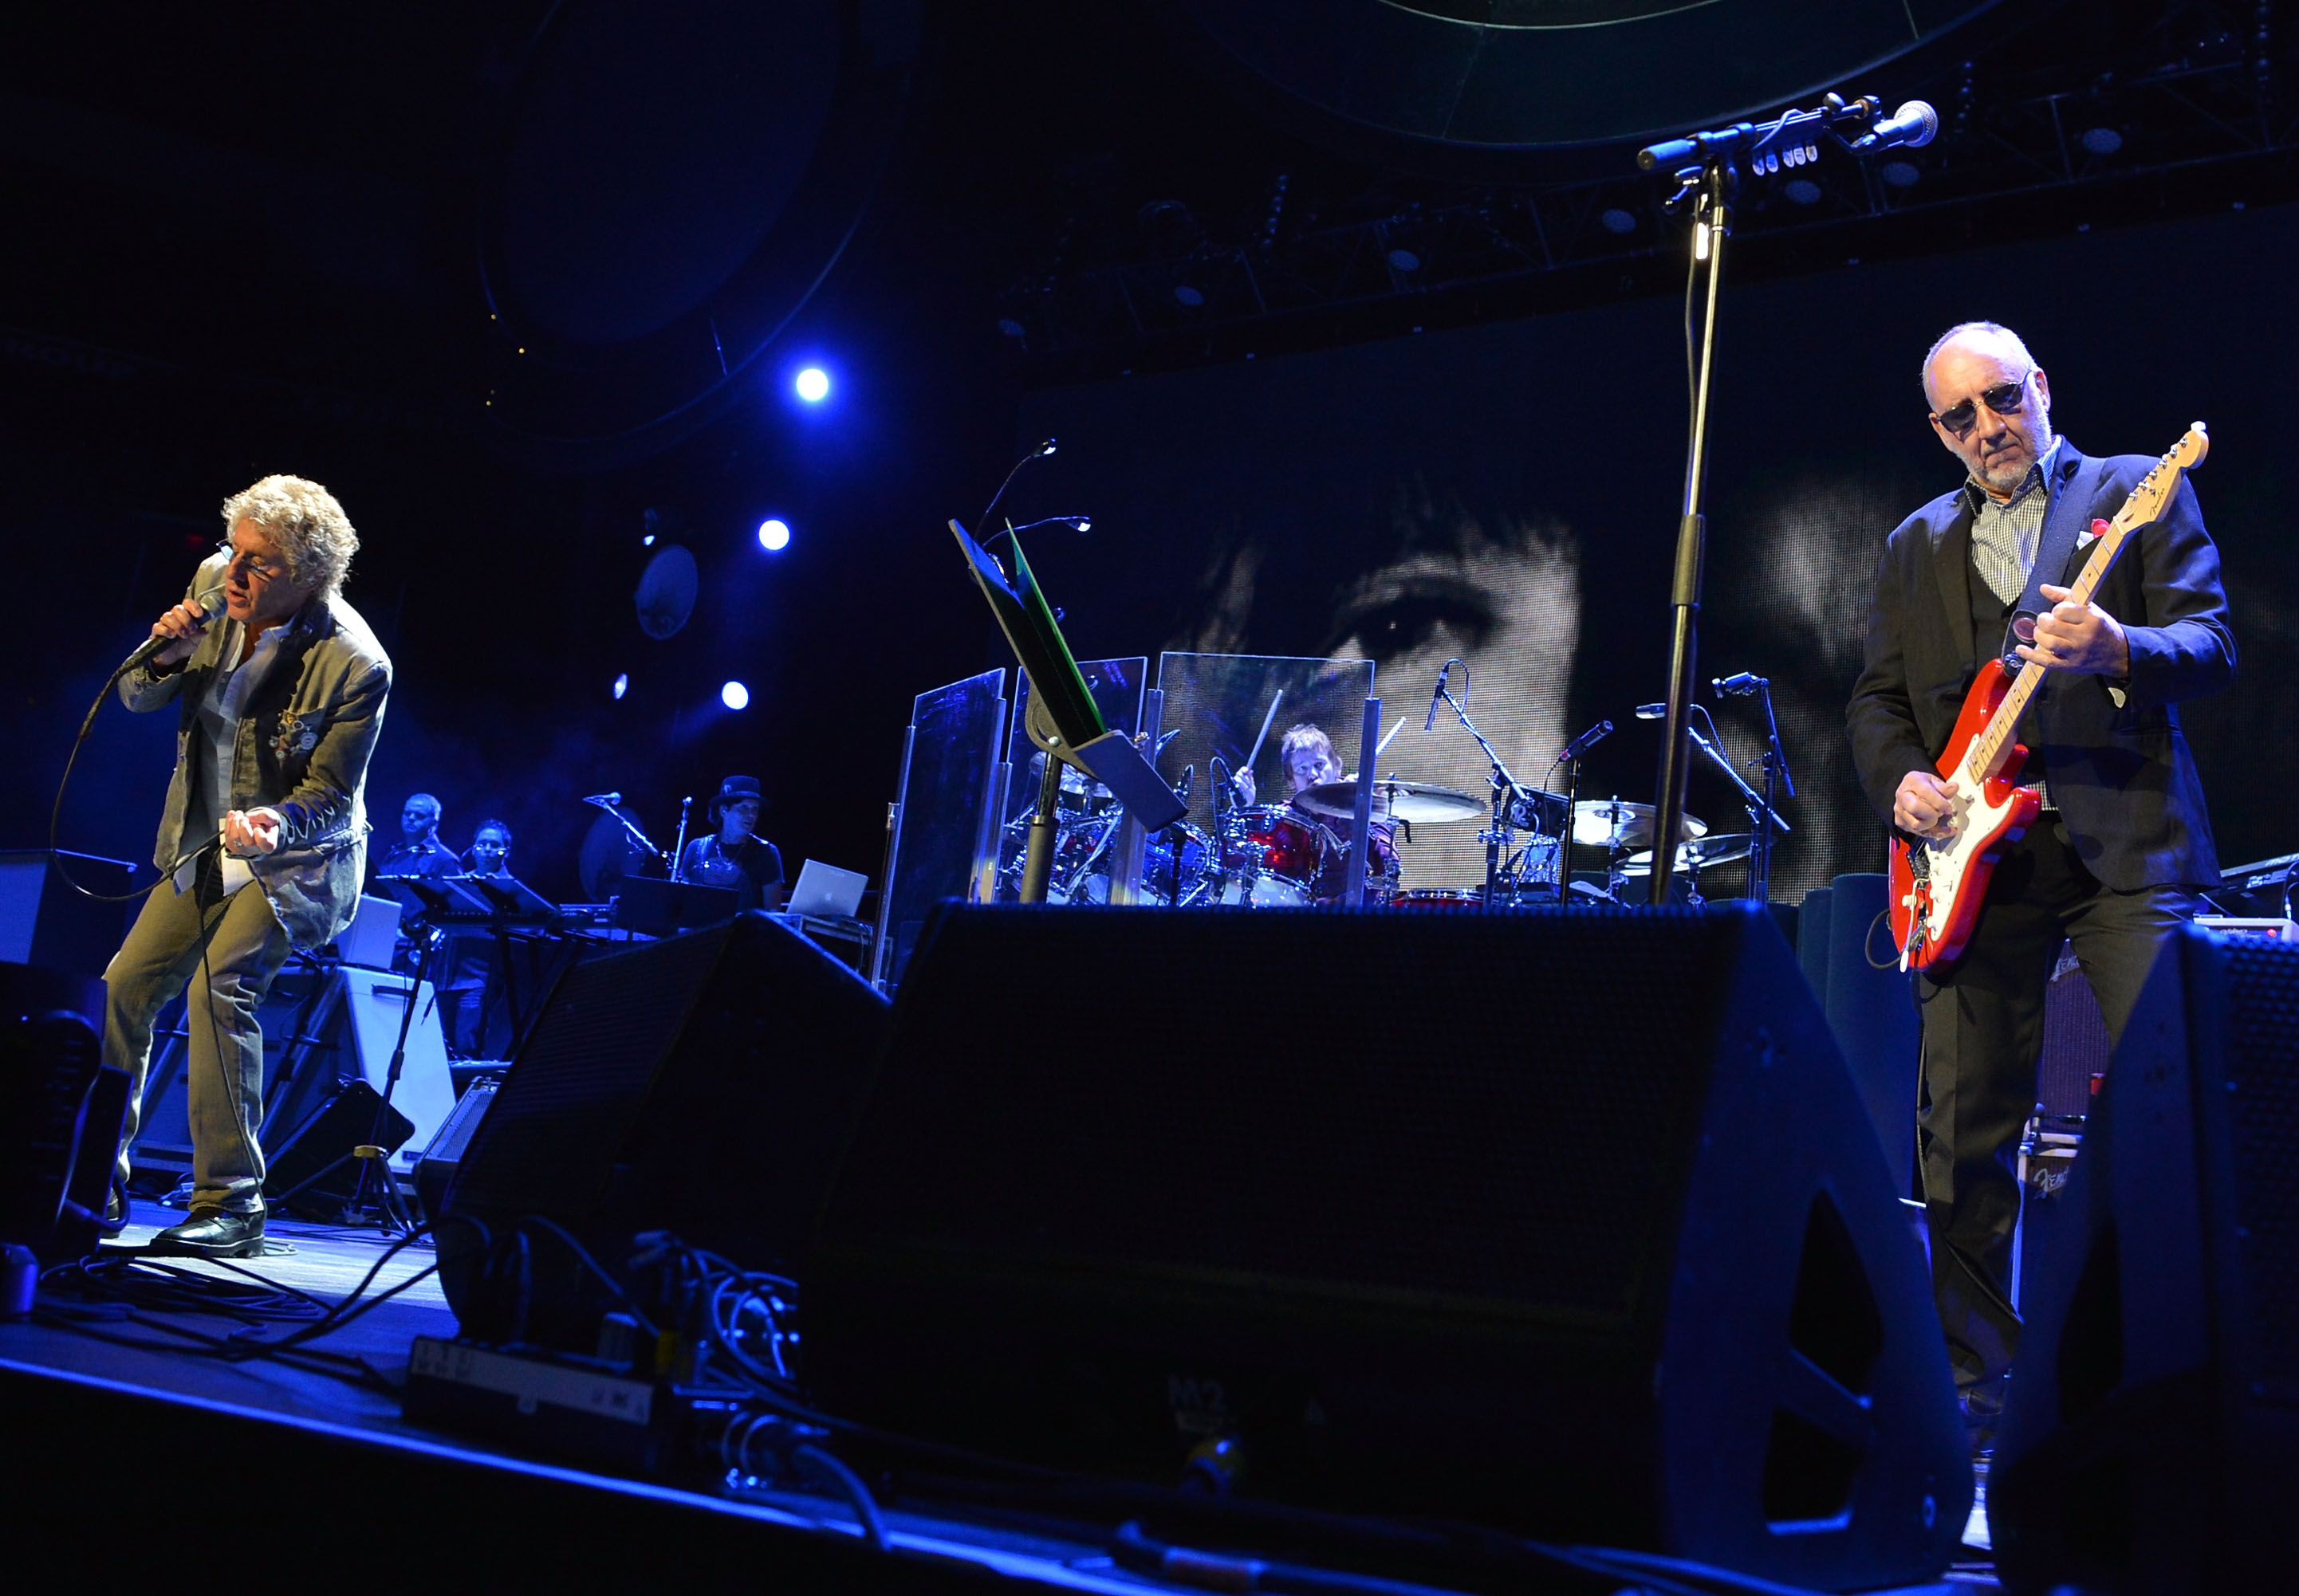 Mundo Musique Throwback Thursday: The Who – Quadrophenia Live in London